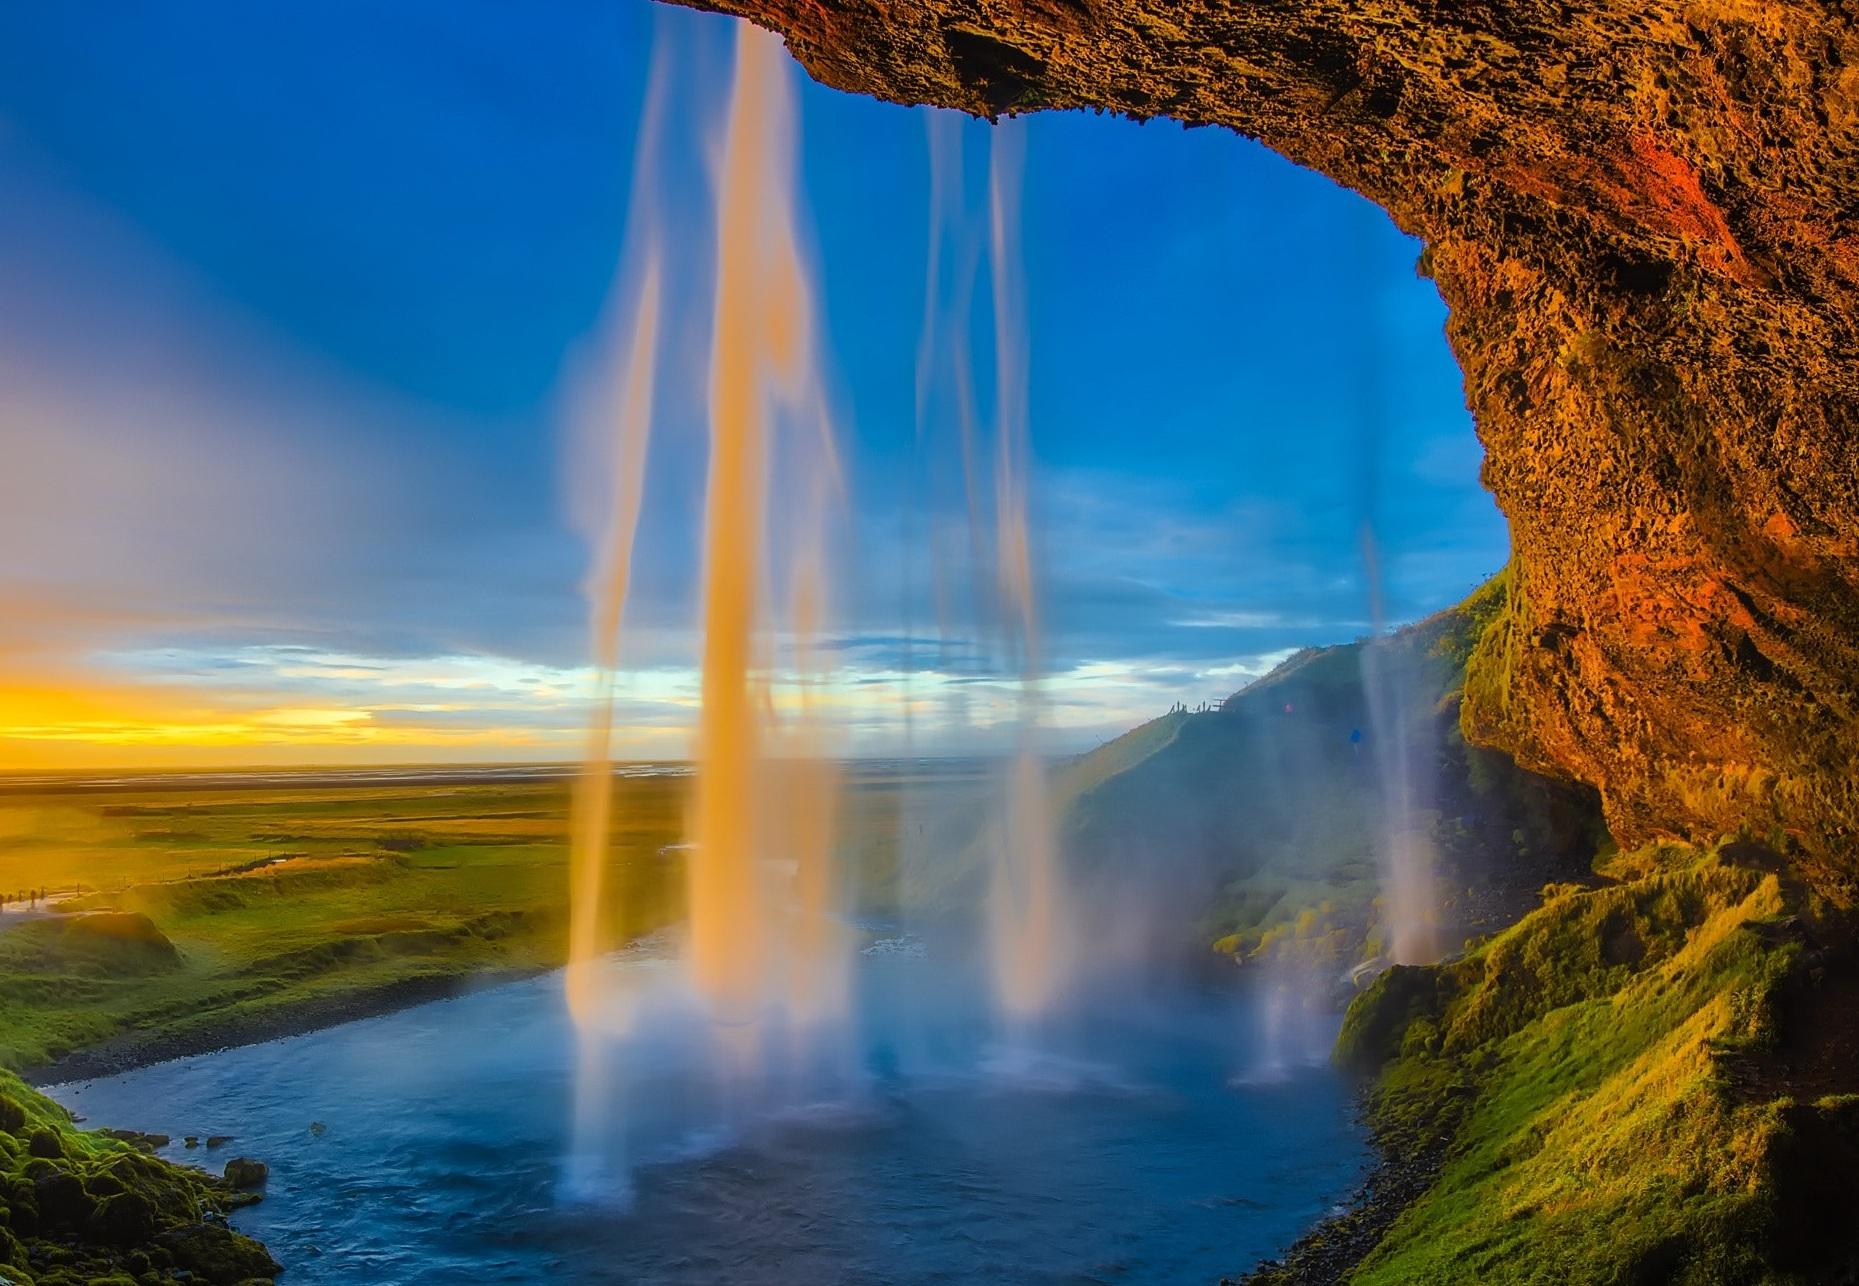 cliff%2C+waterfall.jpg